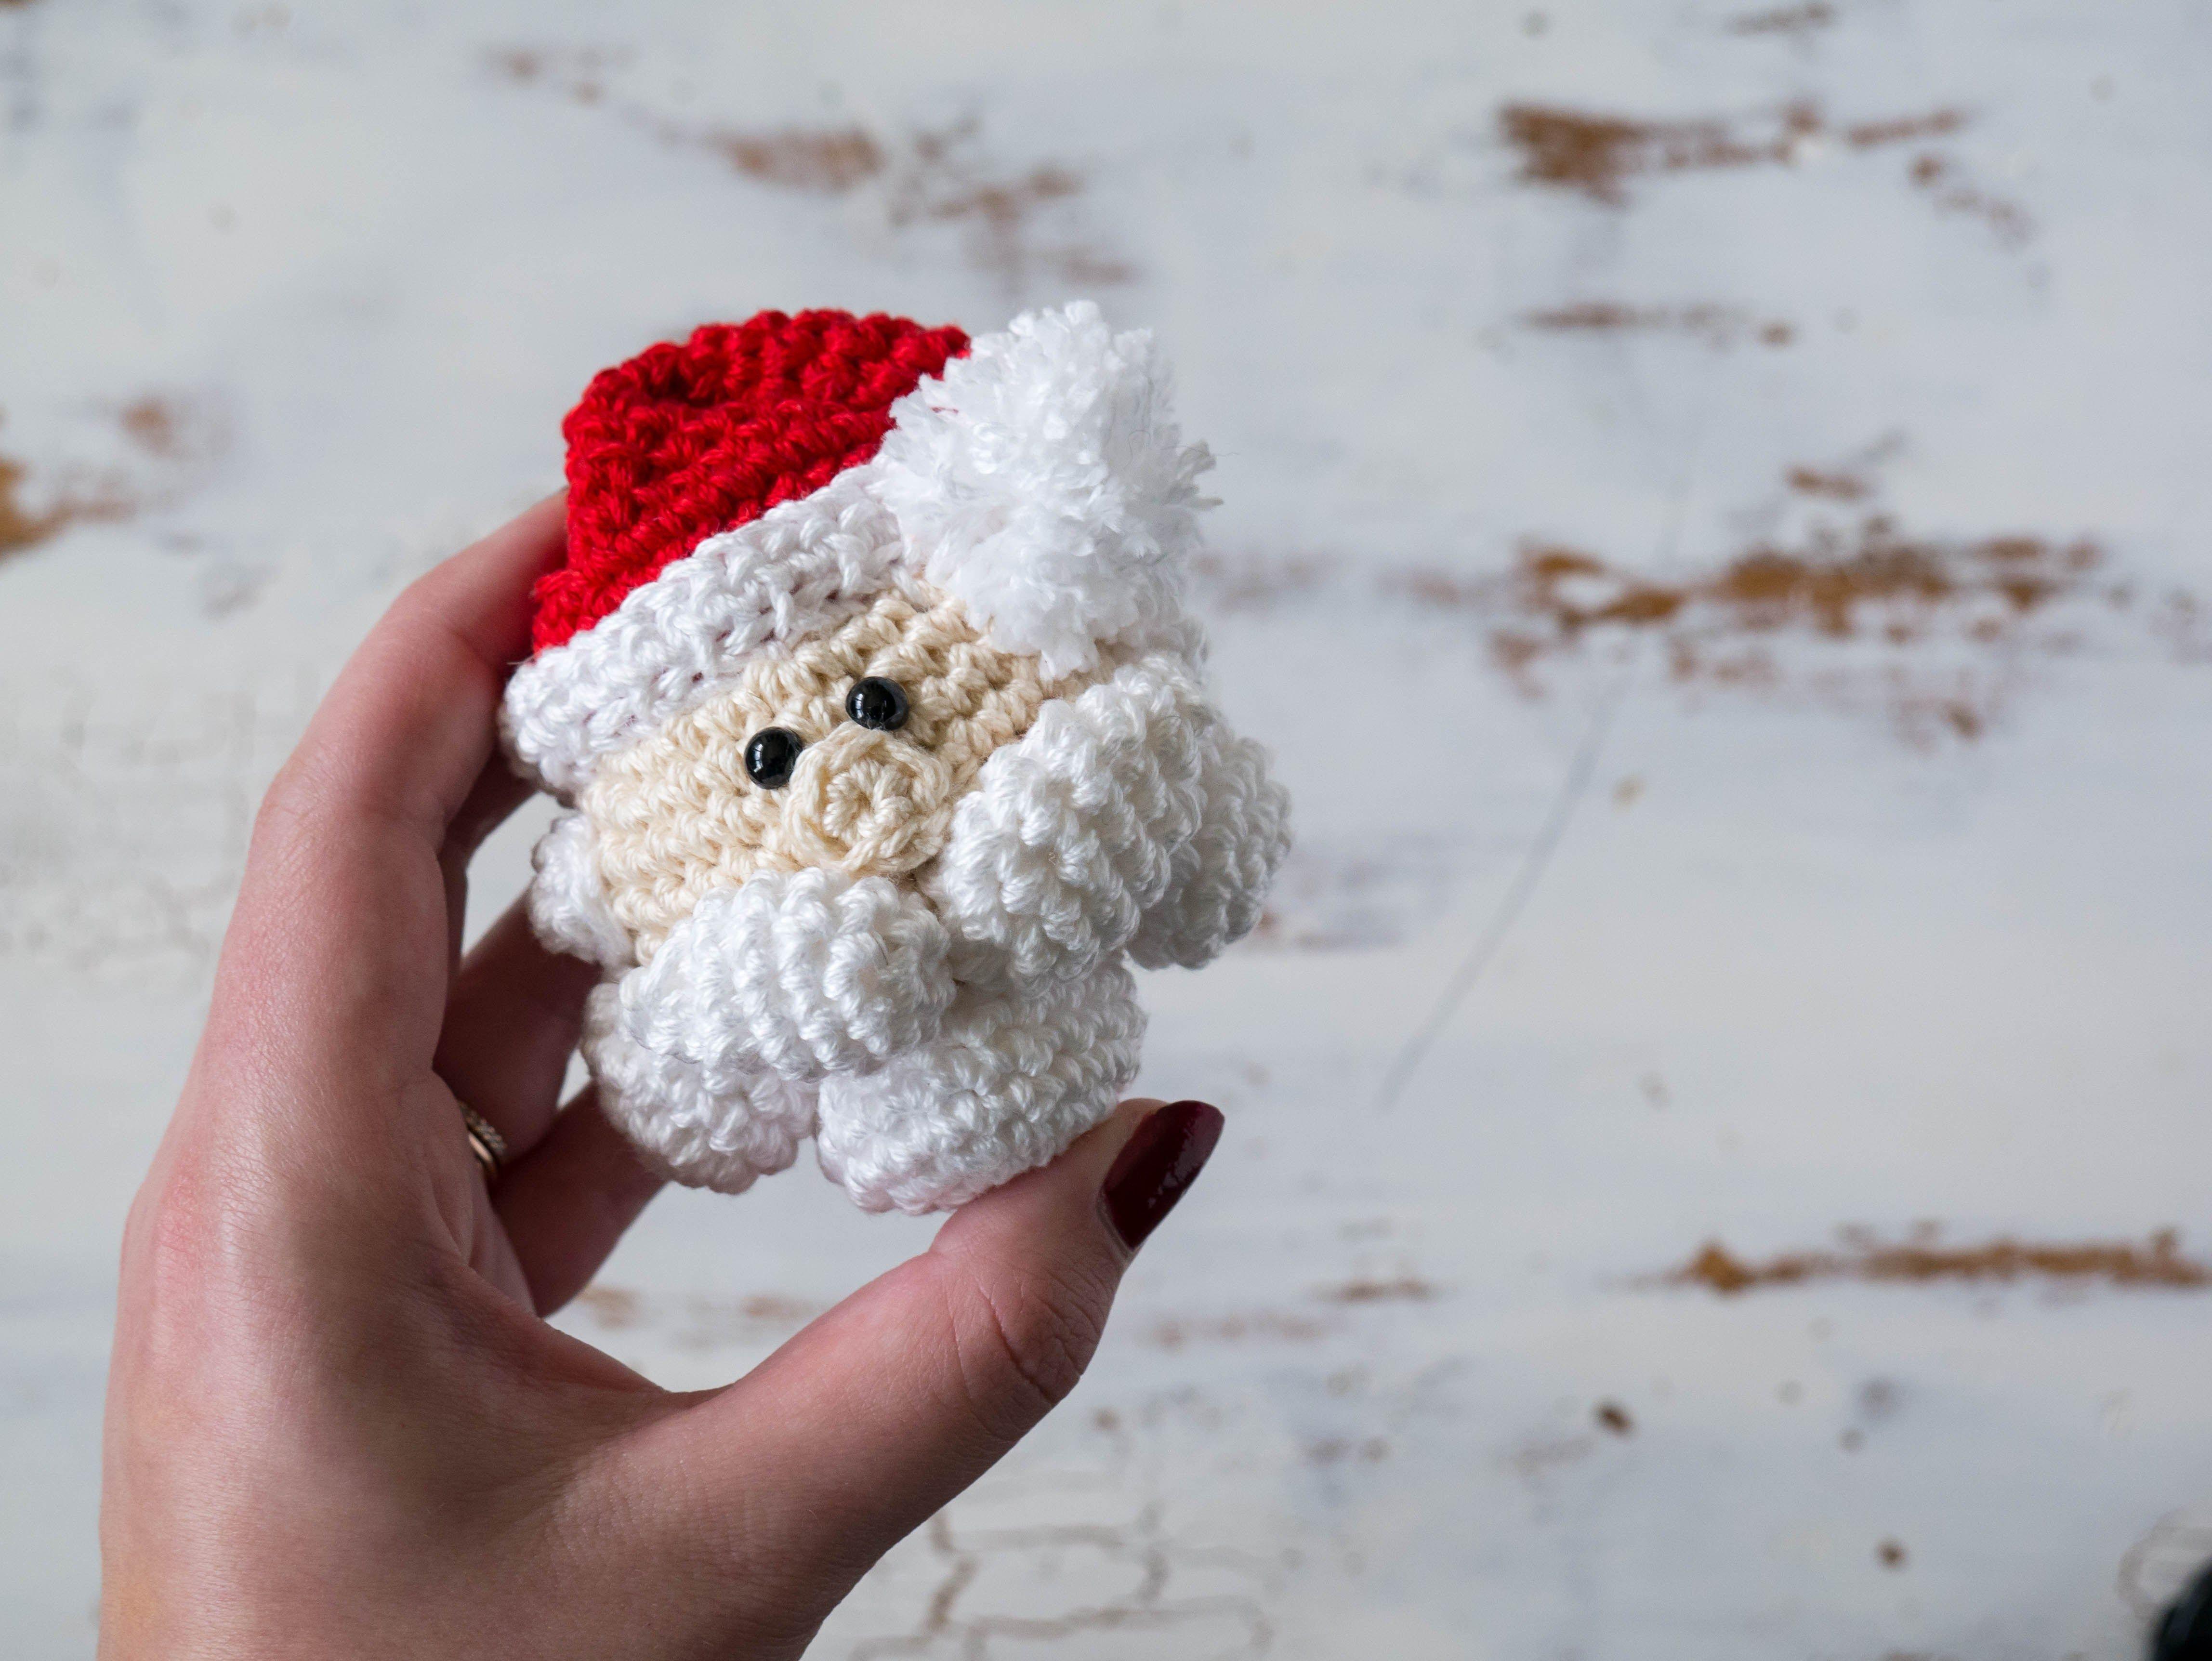 Crochet Santa Claus Christmas Ornament | Adornos navideños, Adornos ...